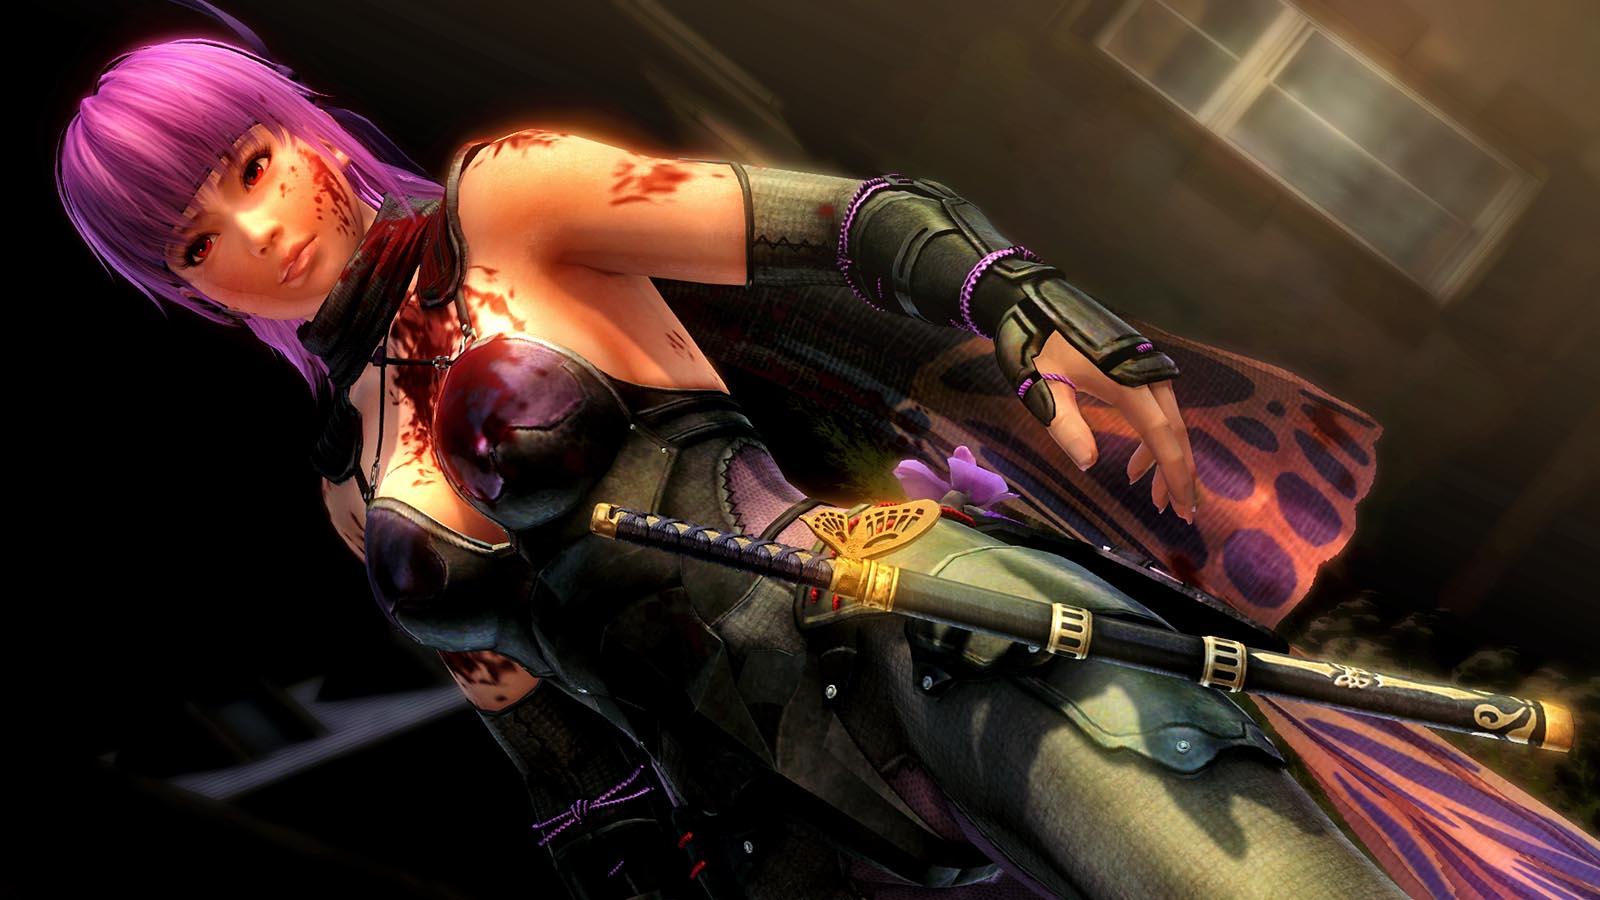 Hd Ninja Gaiden 3 Razor S Edge 7